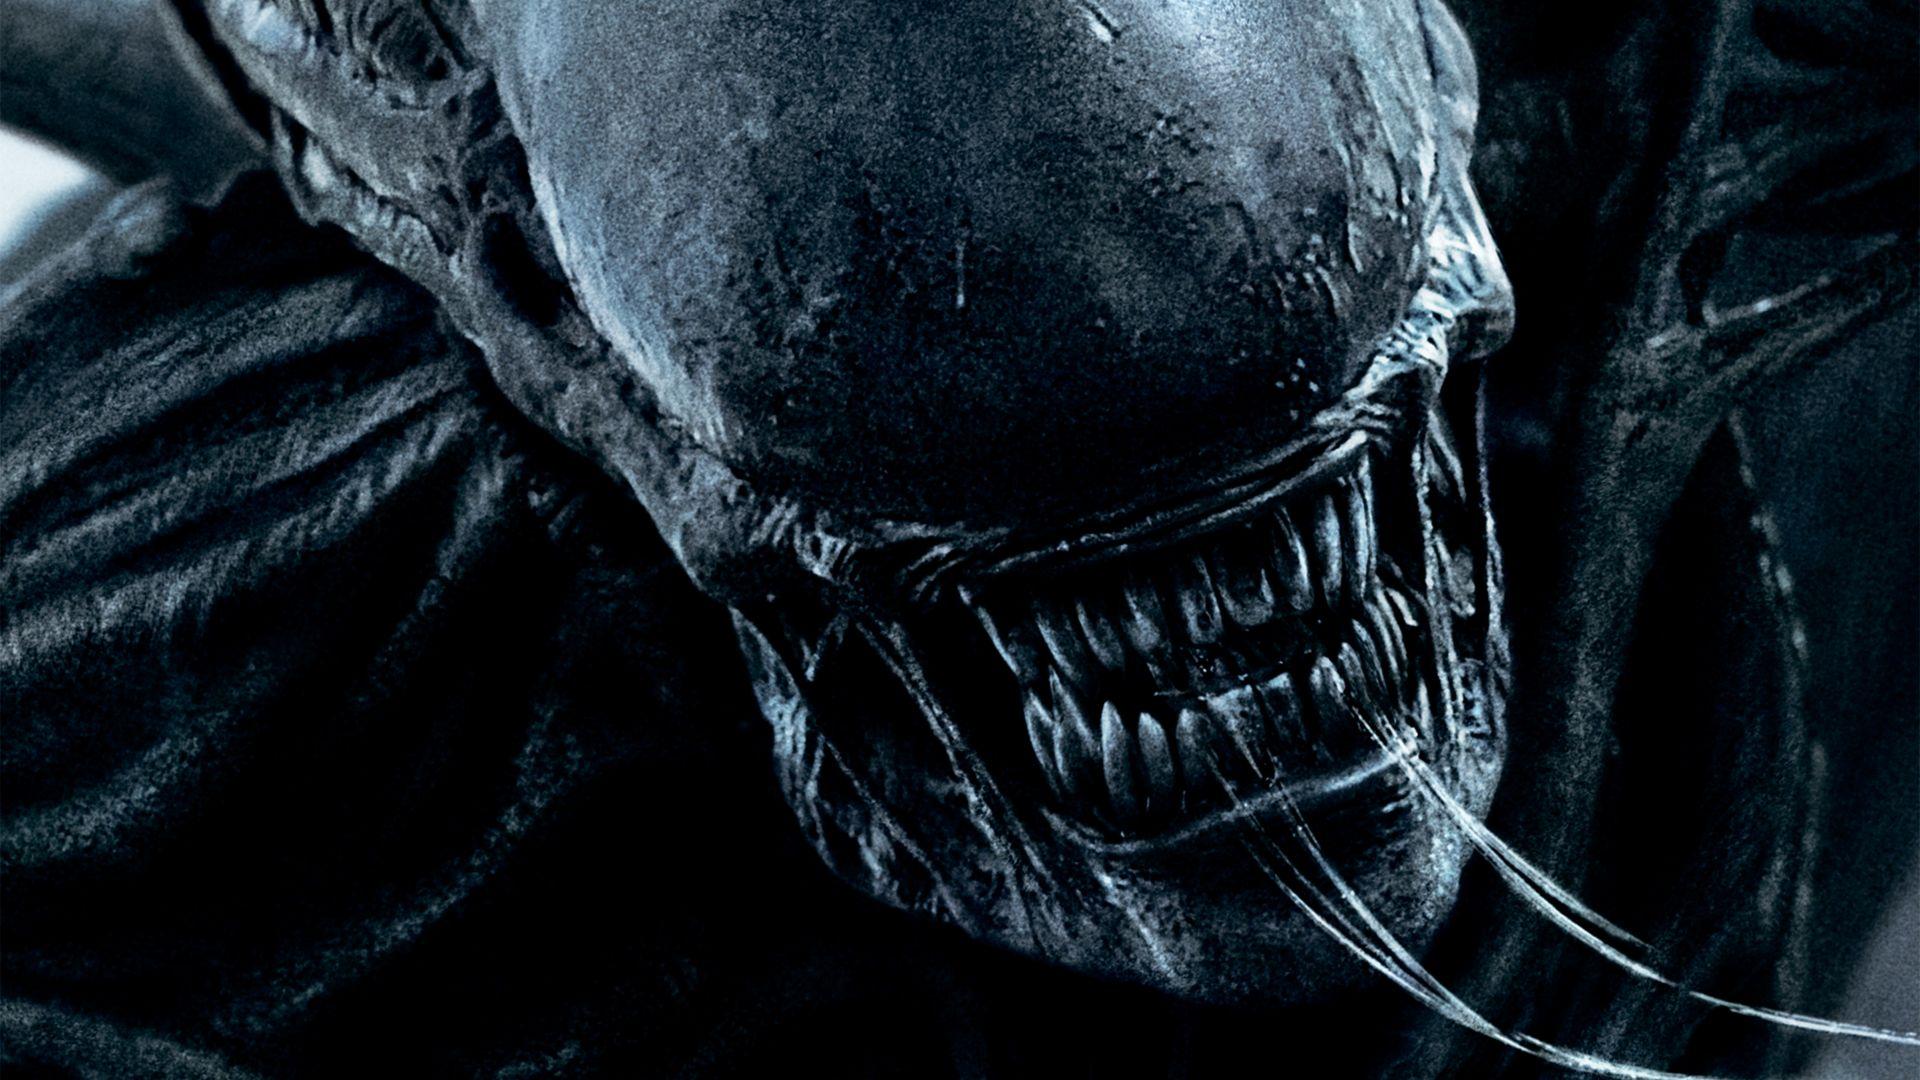 Wallpaper Alien: Covenant, 4k, HD, alien, monster, best movies, Movies #13590 - 웹